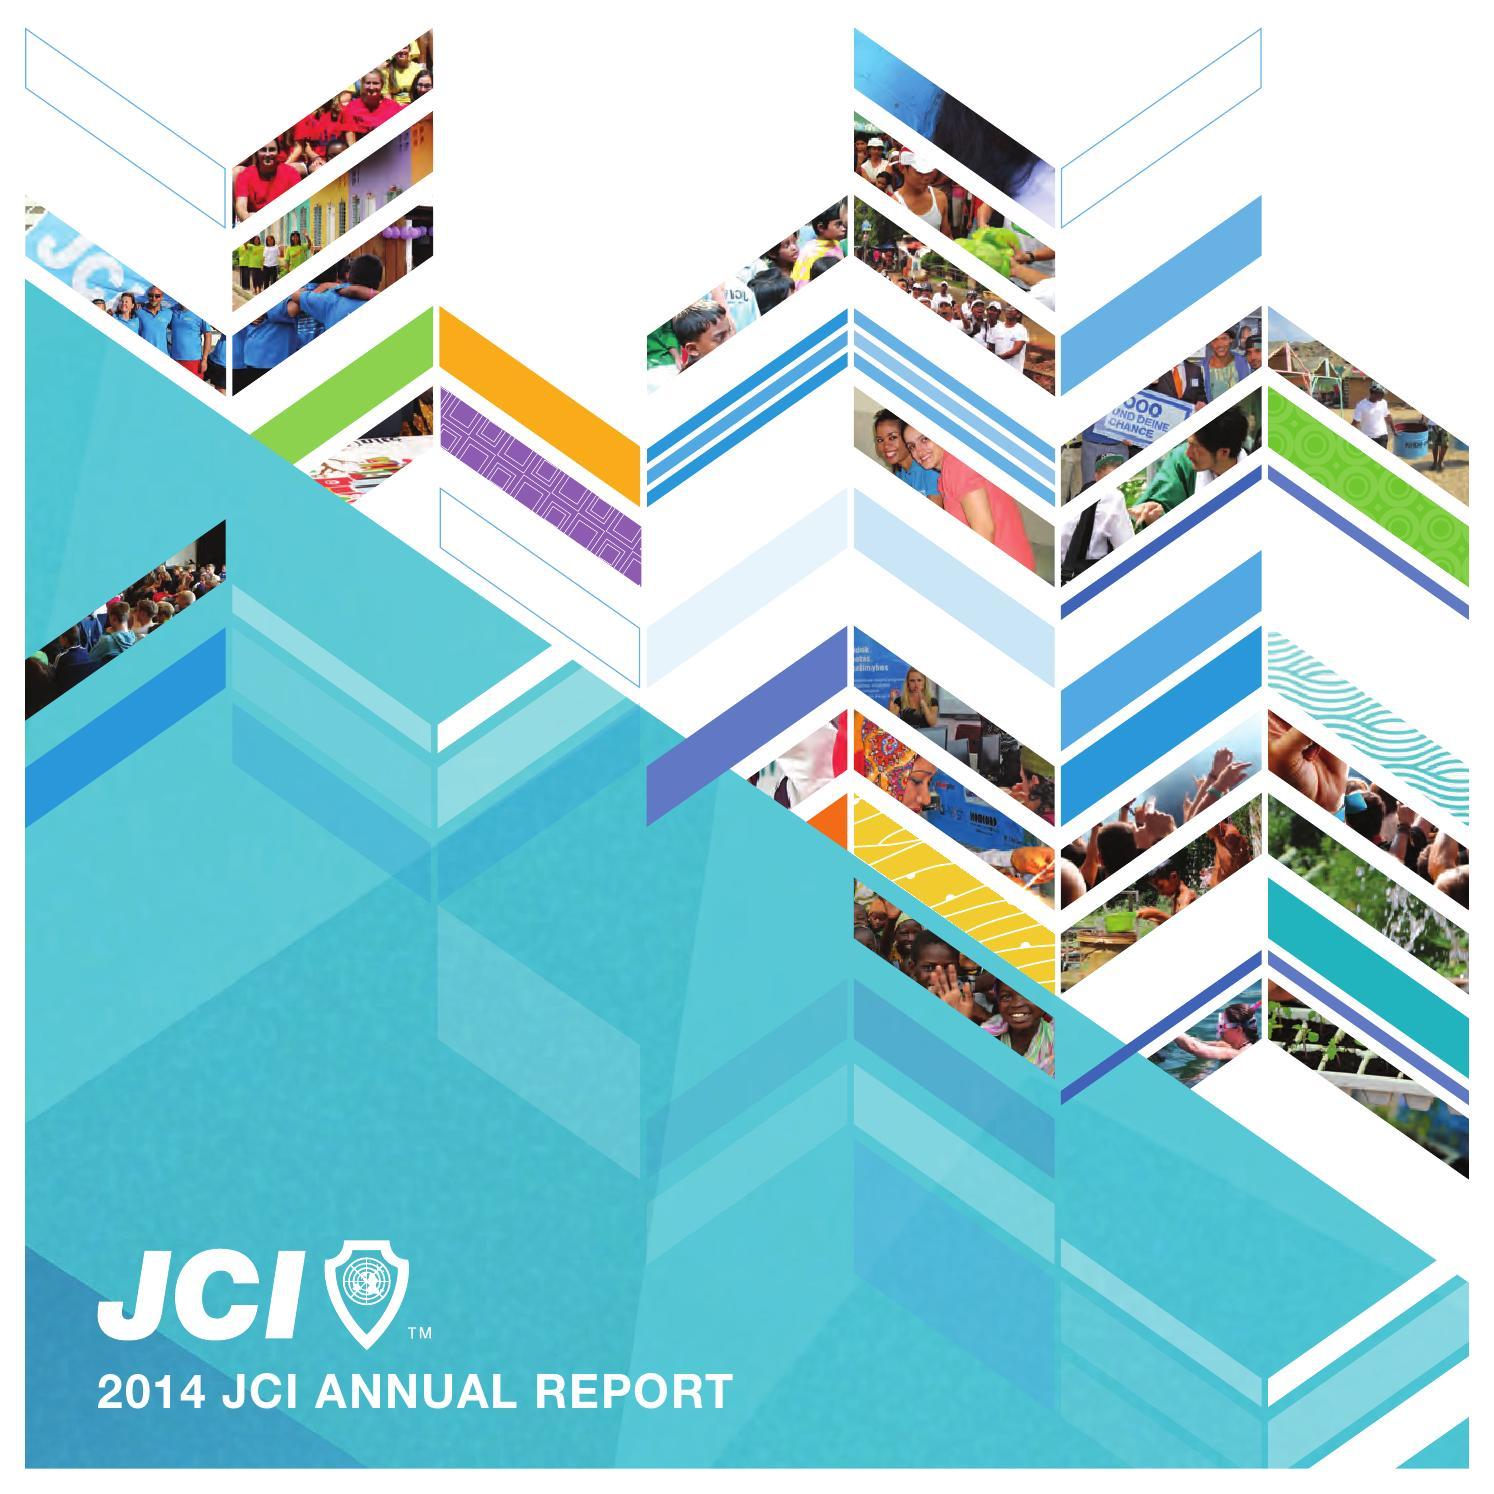 2014 JCI Annual Report by Junior Chamber International - issuu